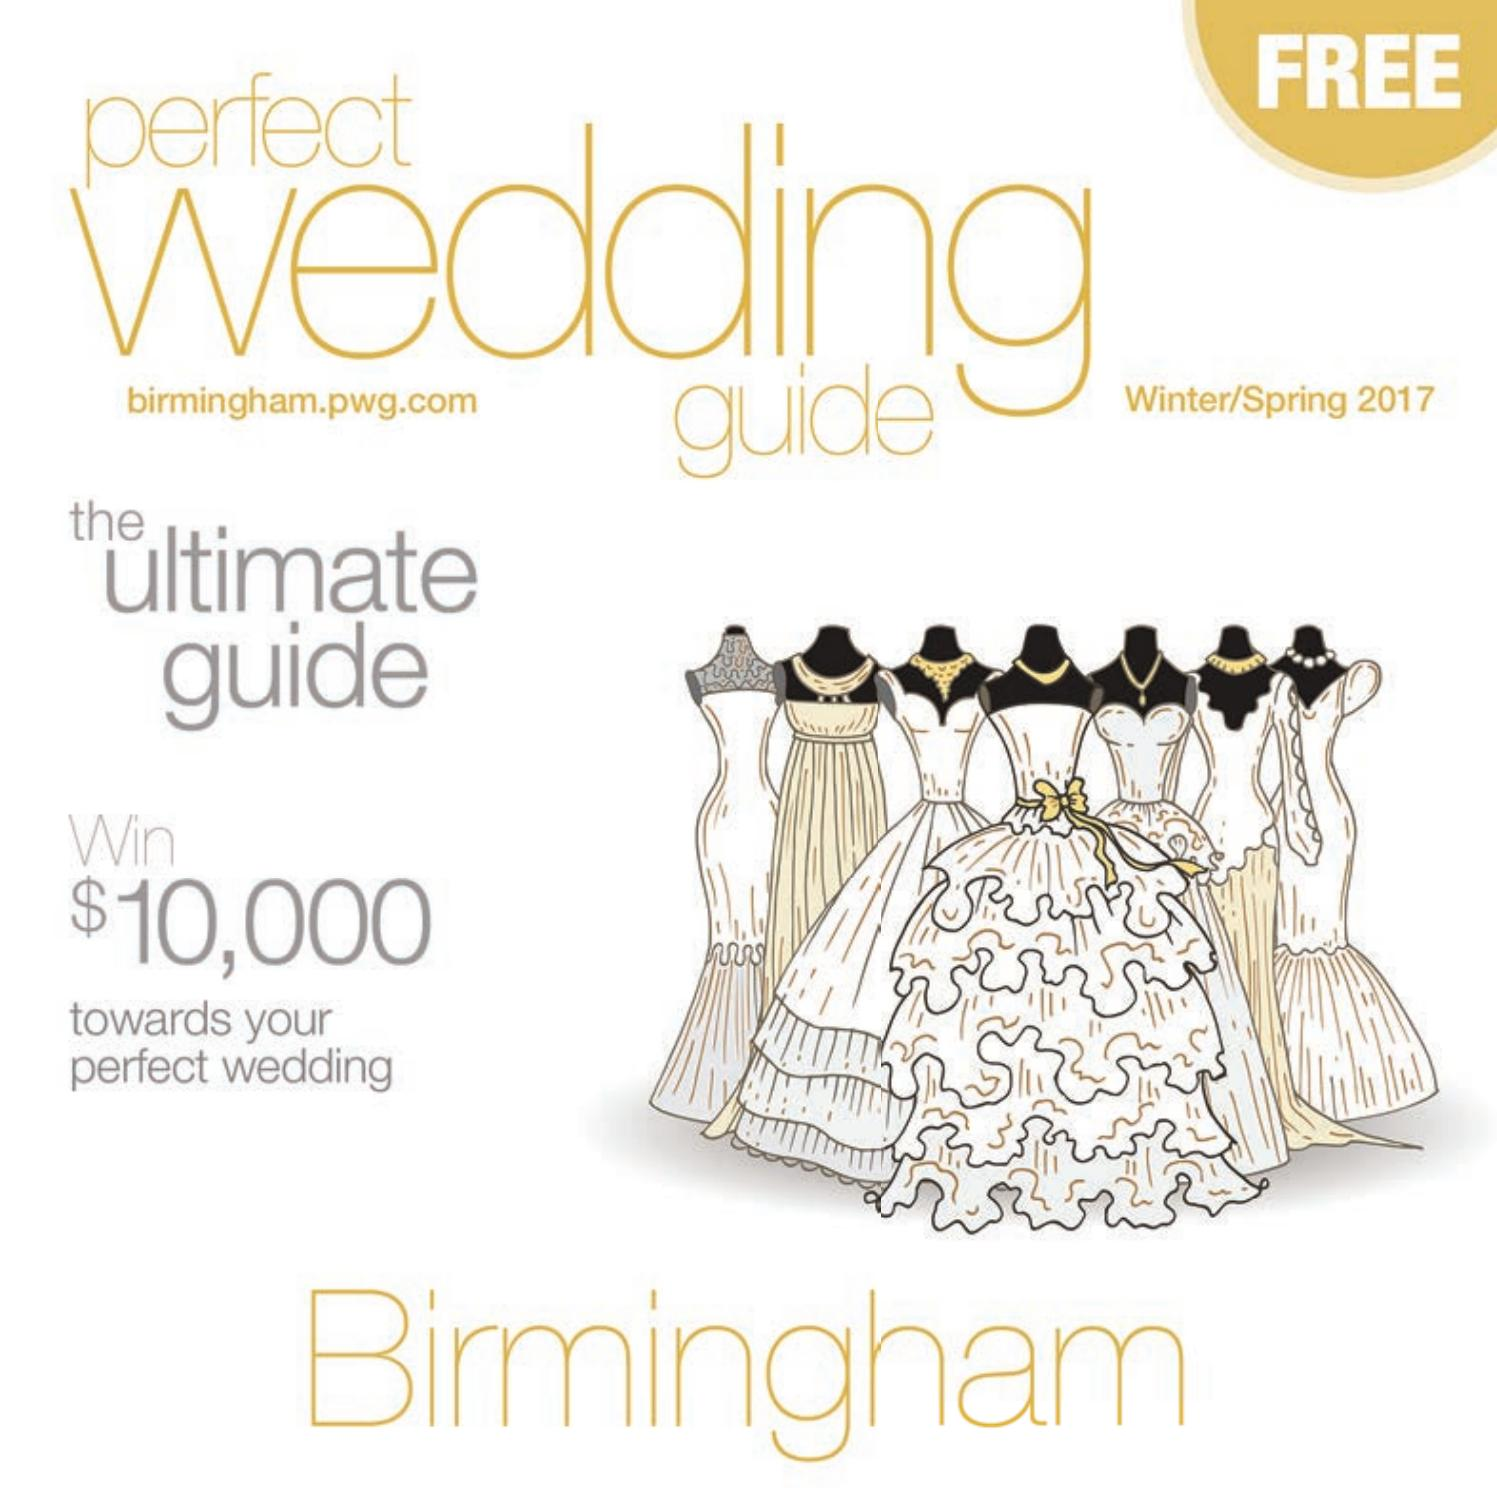 0ac93432ca Perfect Wedding Guide Birmingham Winter/Spring 2017 by Rick Caldwell - issuu